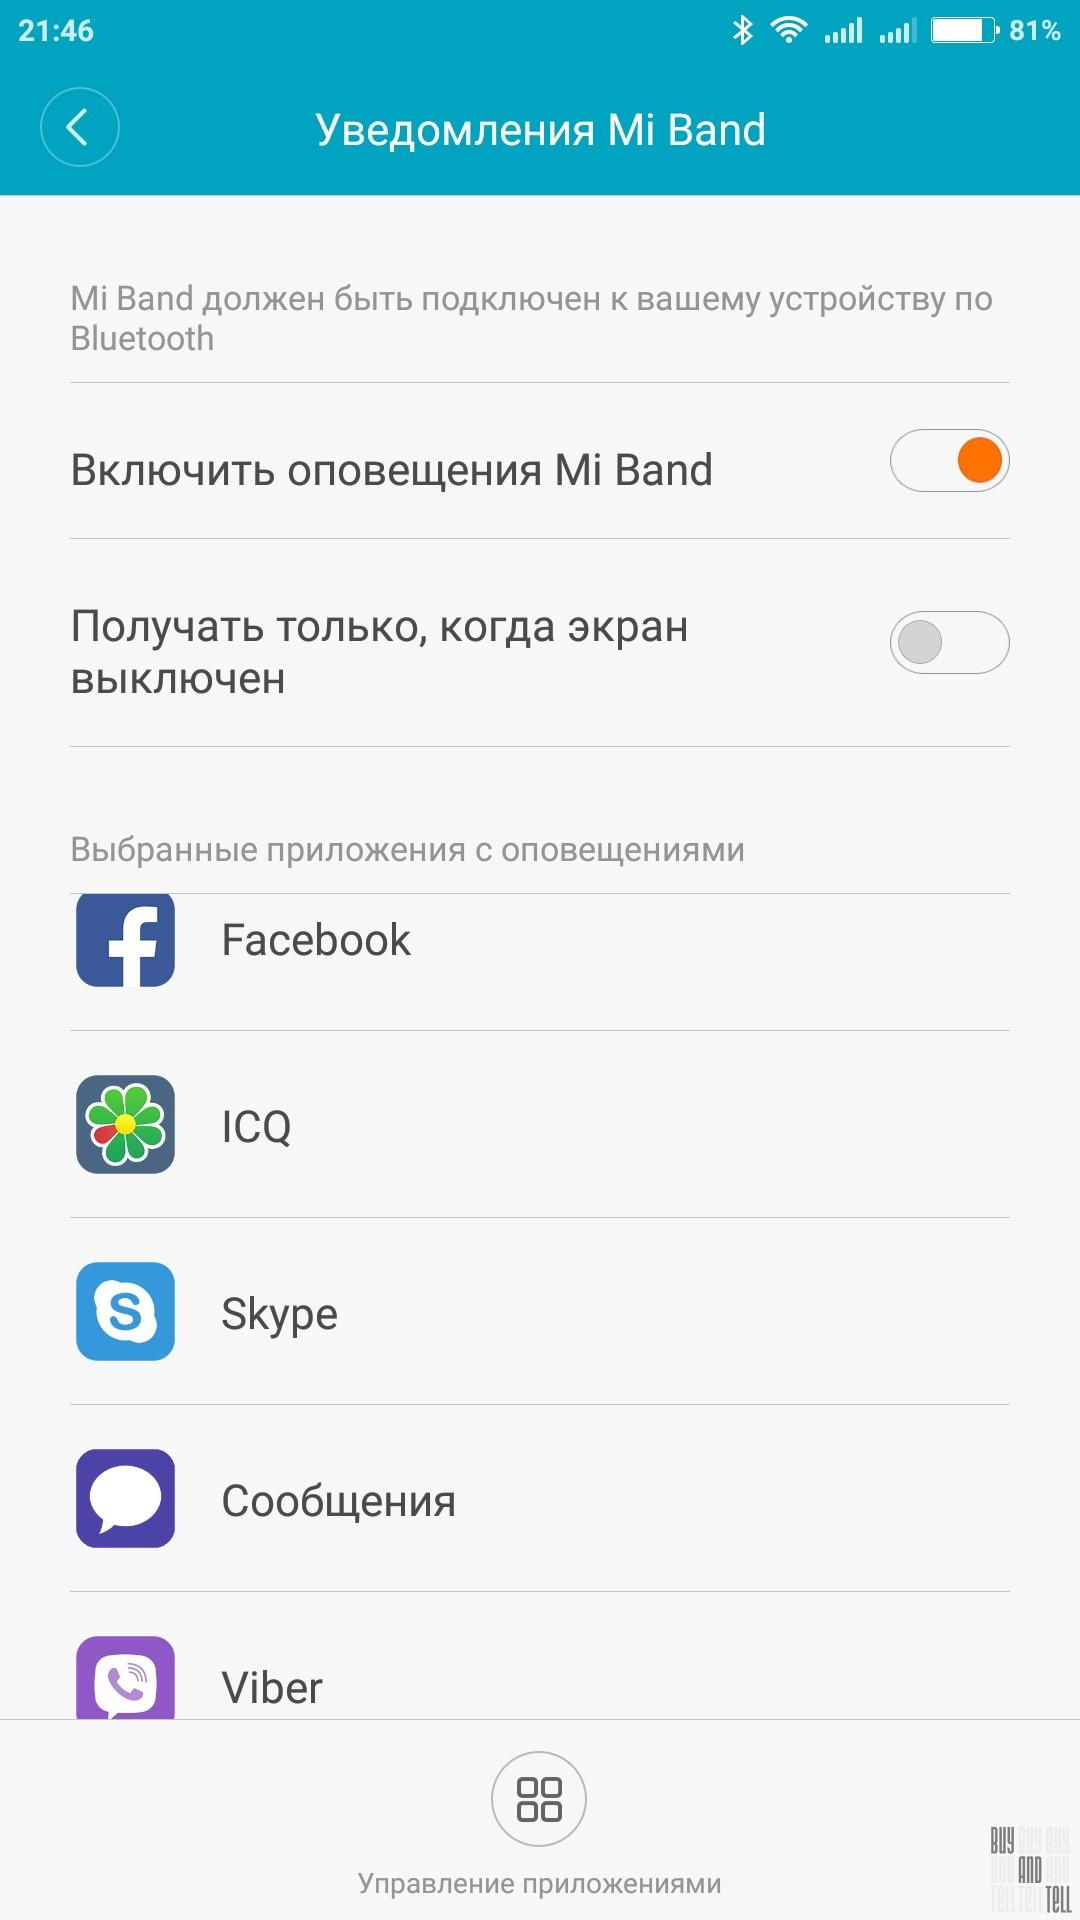 fd6a81830da3 Xiaomi Mi Band 2 - обзор товара с фото - Купи и Расскажи